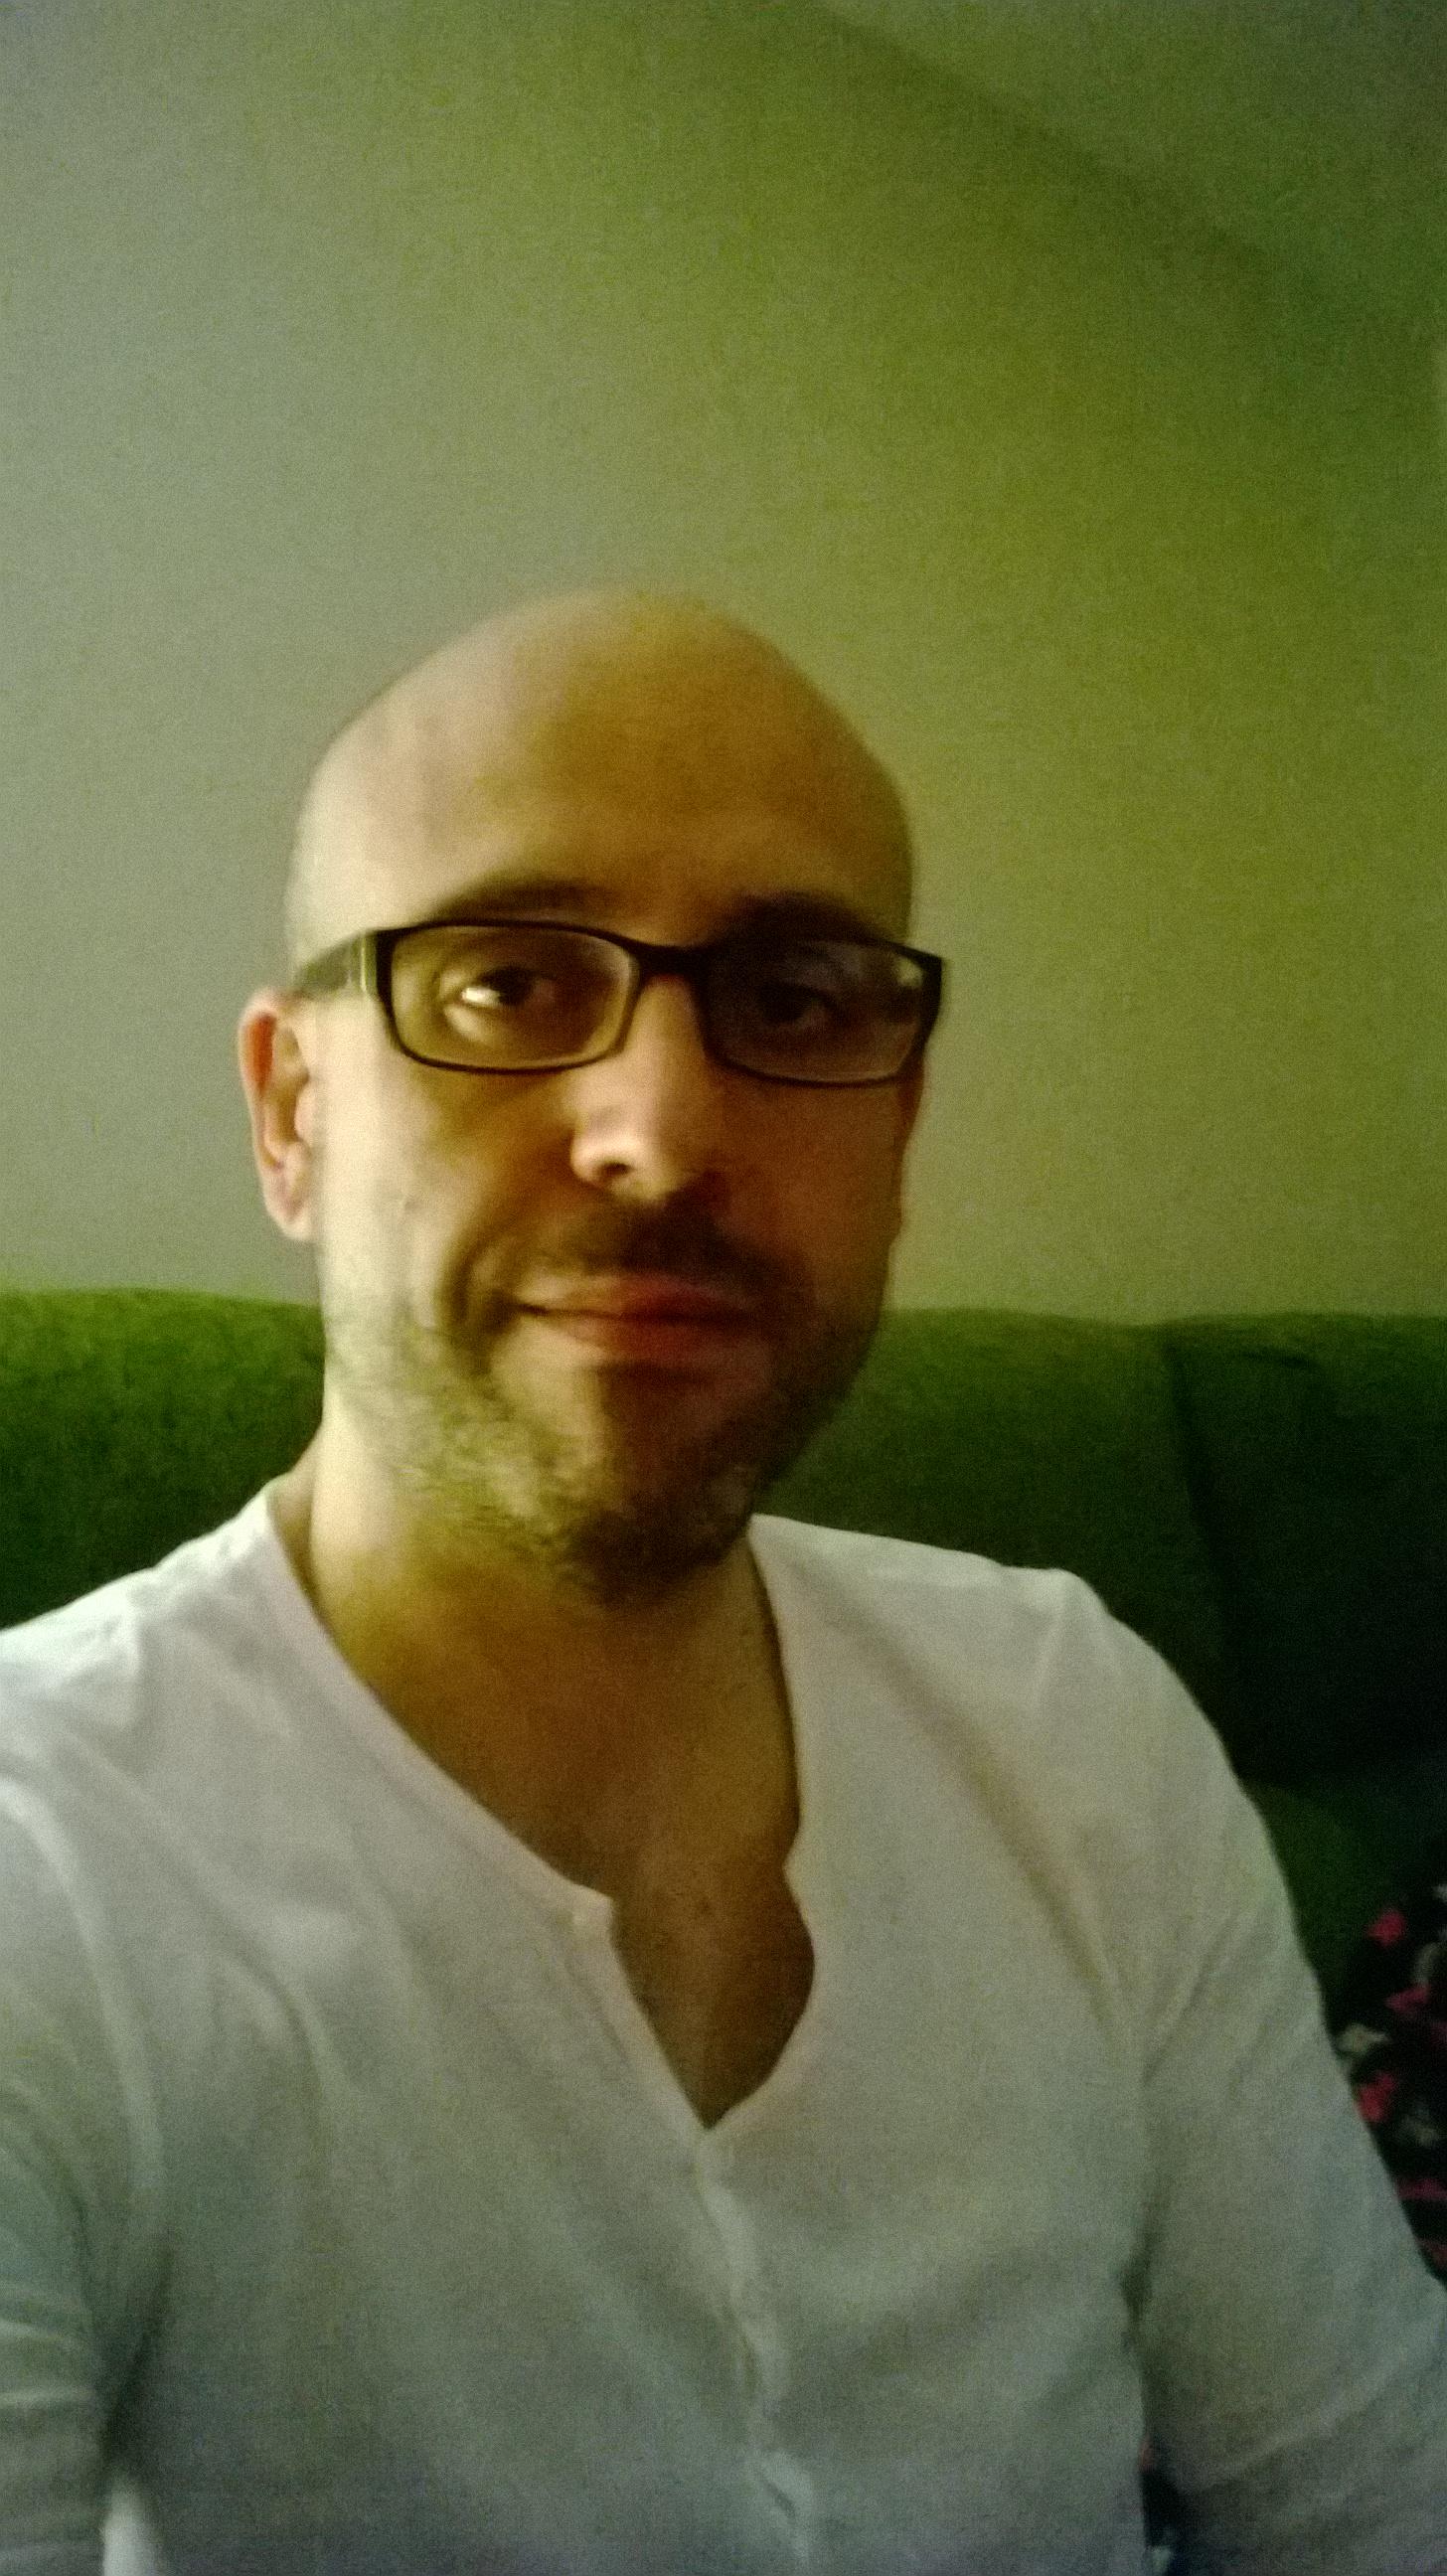 Patxi, psicólogo comprometido